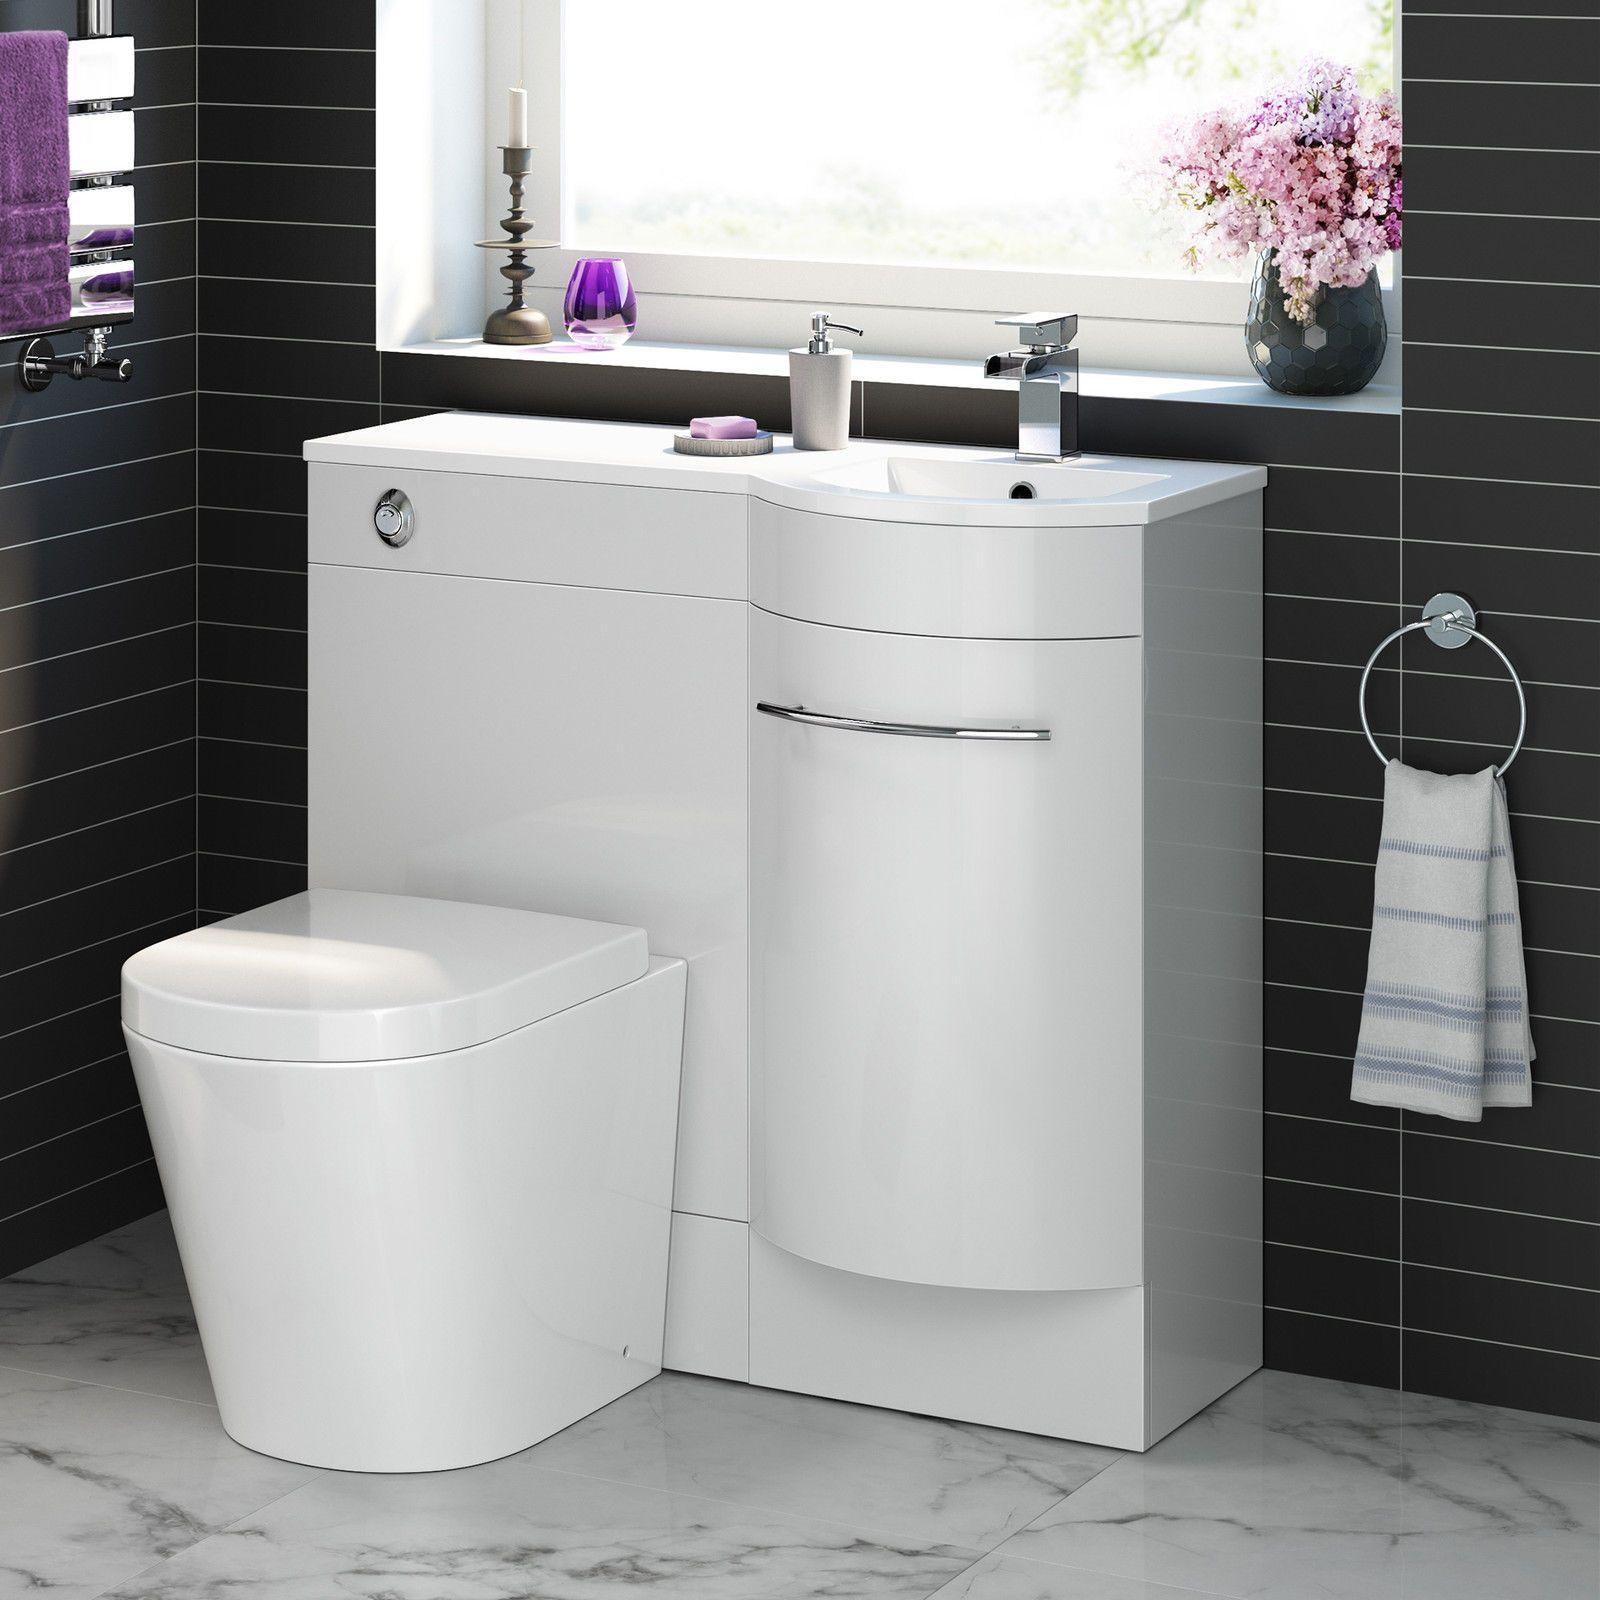 Modern Bathroom White Vanity Unit Countertop Basin + Back ...